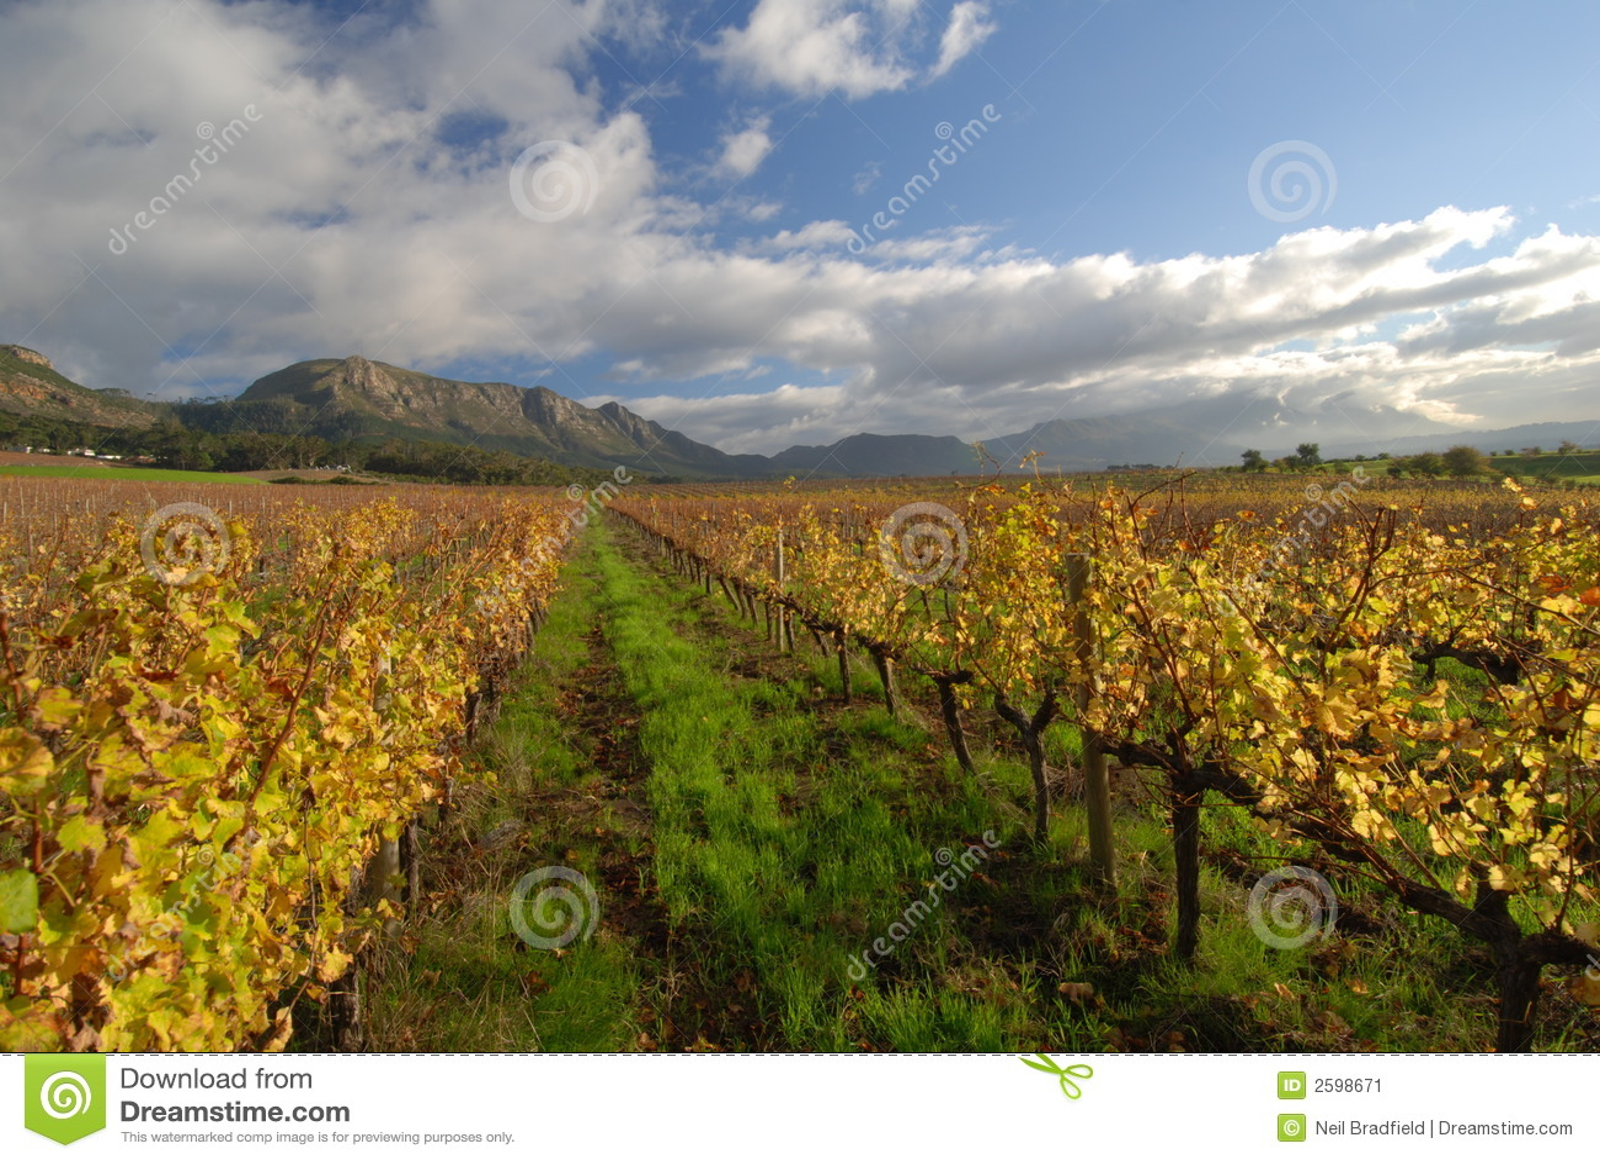 Cape town wine view